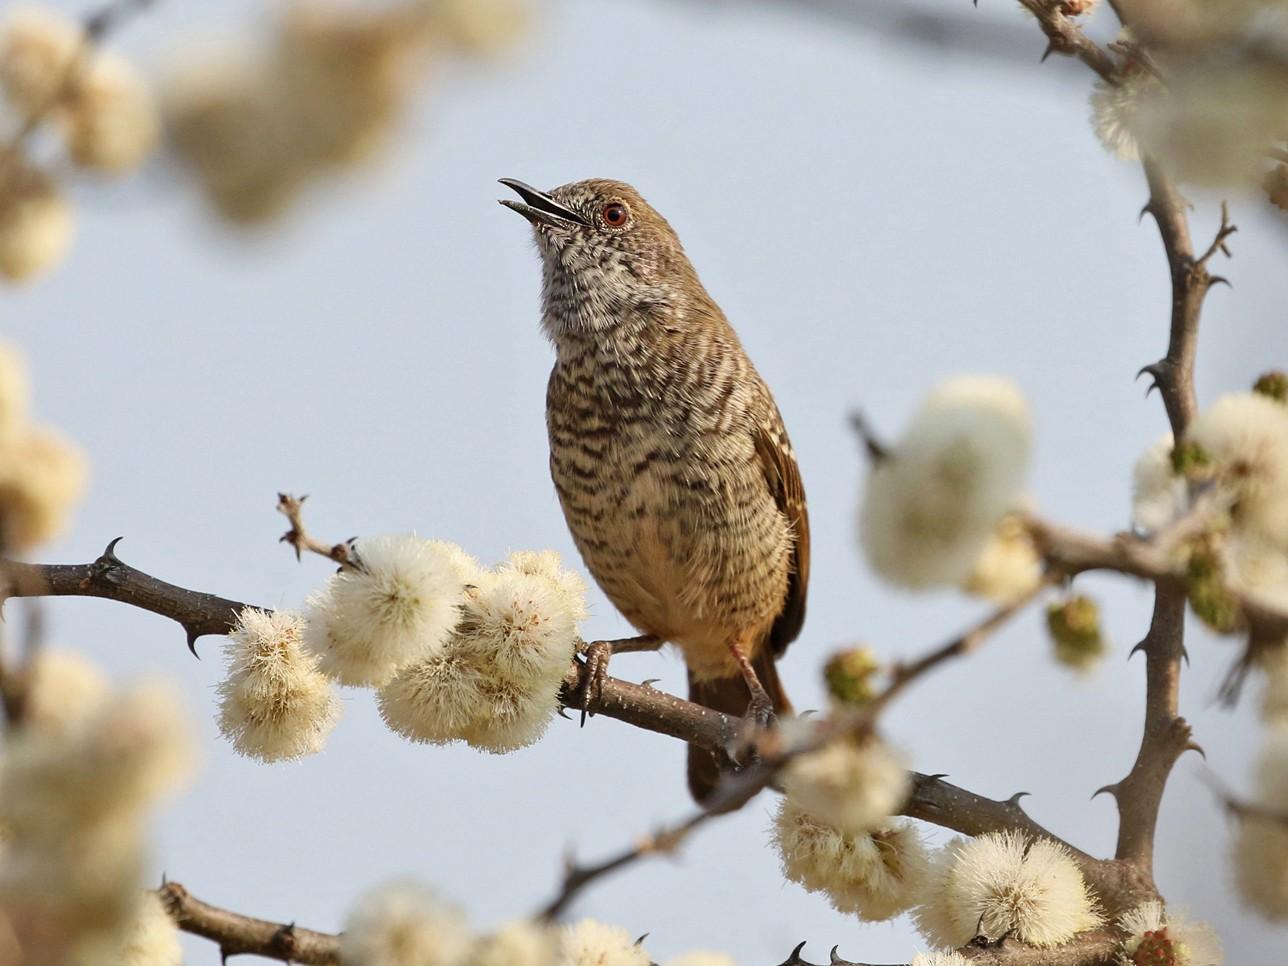 Barred Wren-Warbler - Charley Hesse